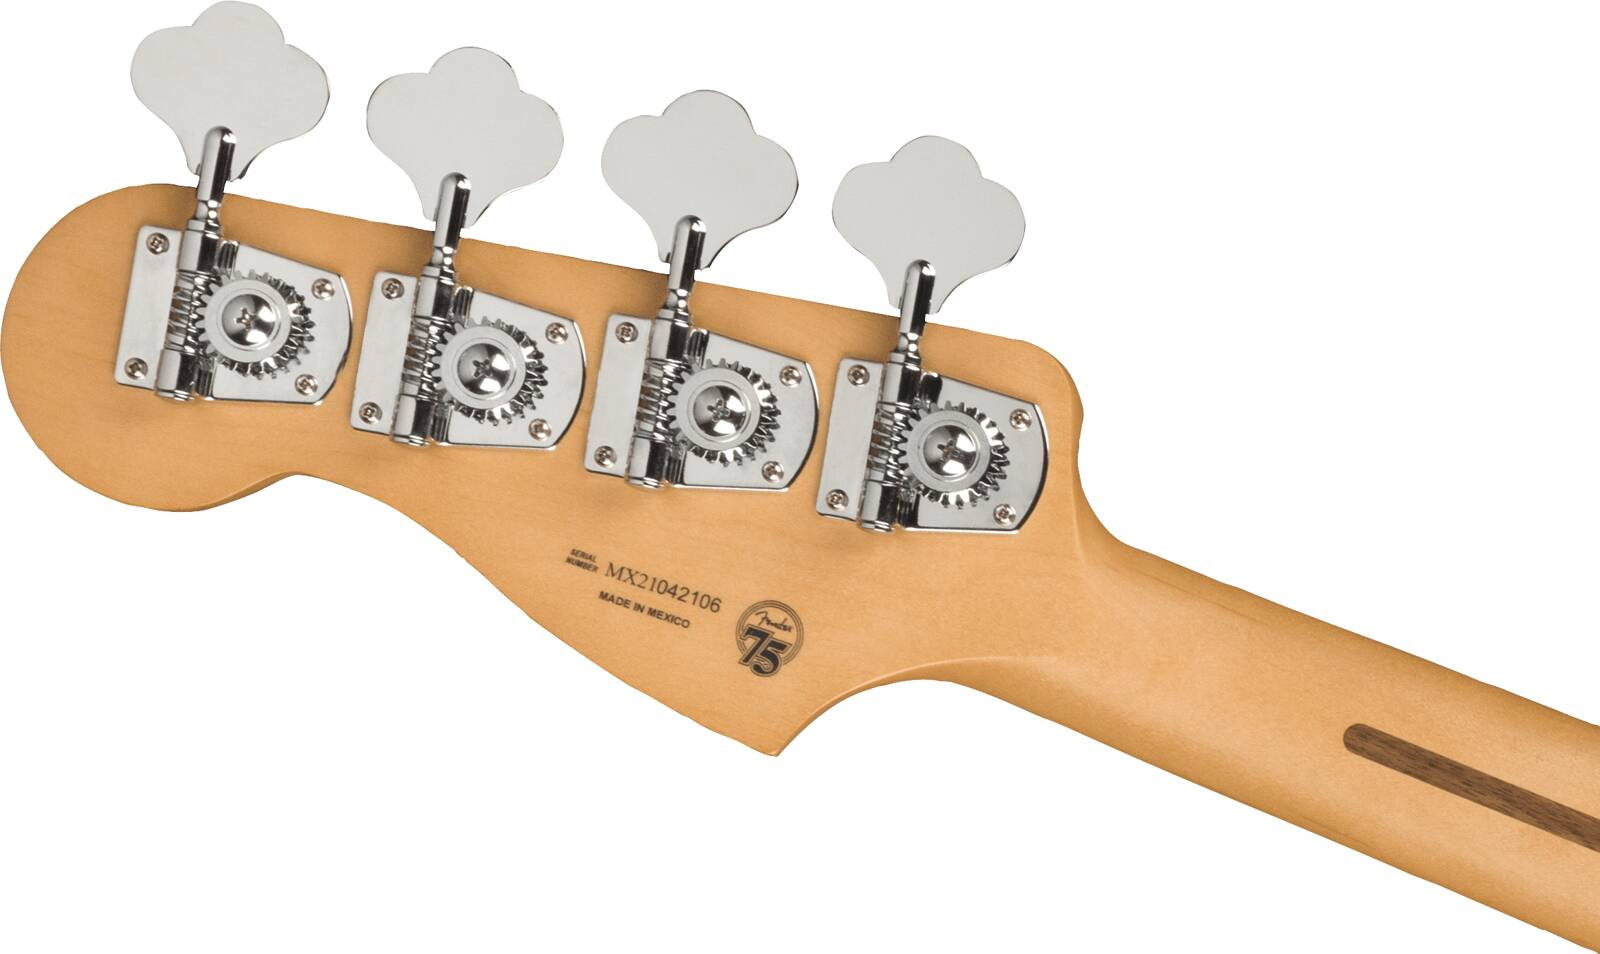 Fender Player Plus Precision Bass, Maple Fingerboard, Silver Smoke : photo 5